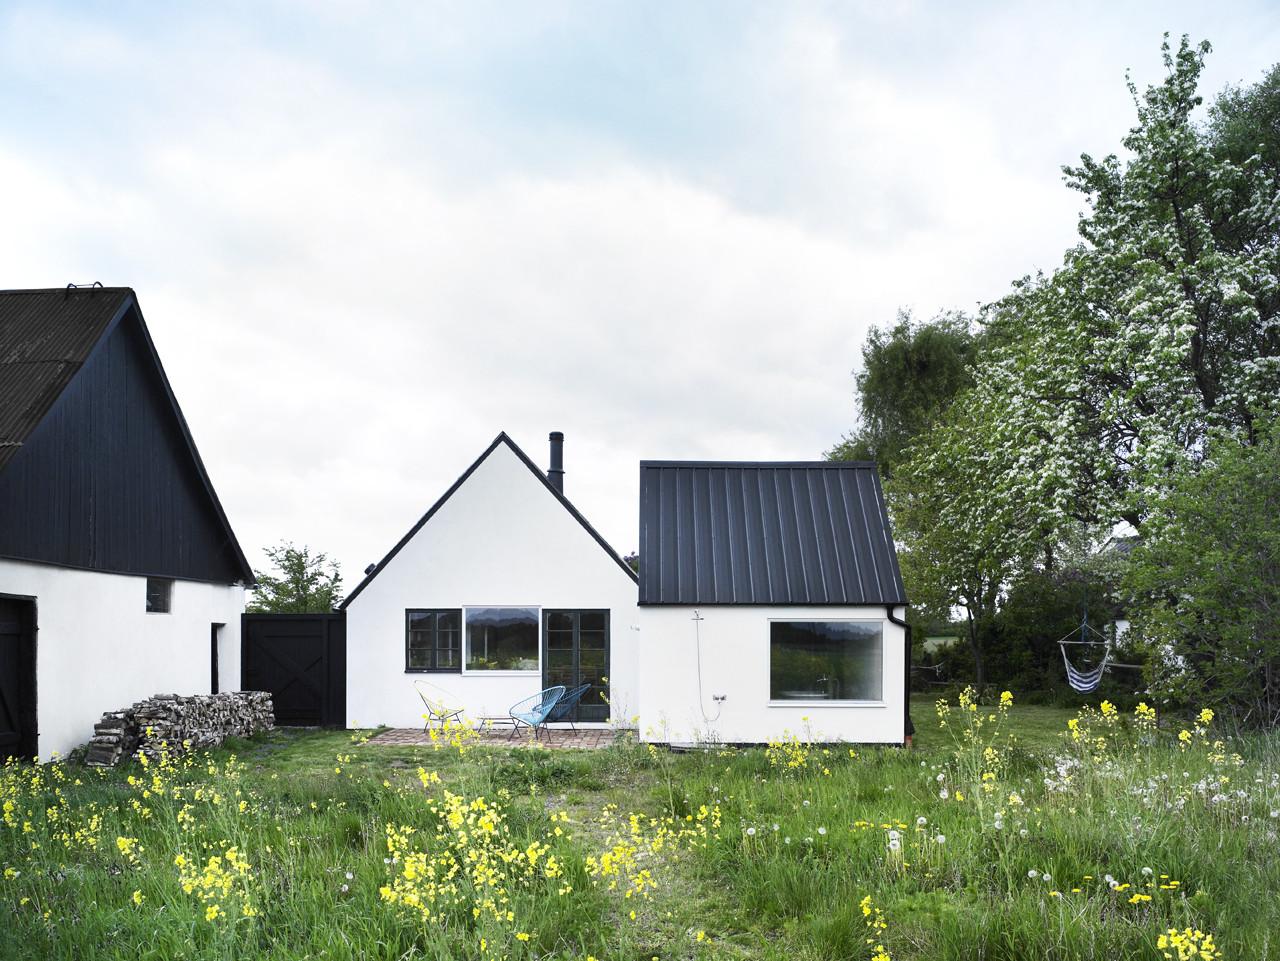 Summer House / LASC Studio, © Stamers Kontor